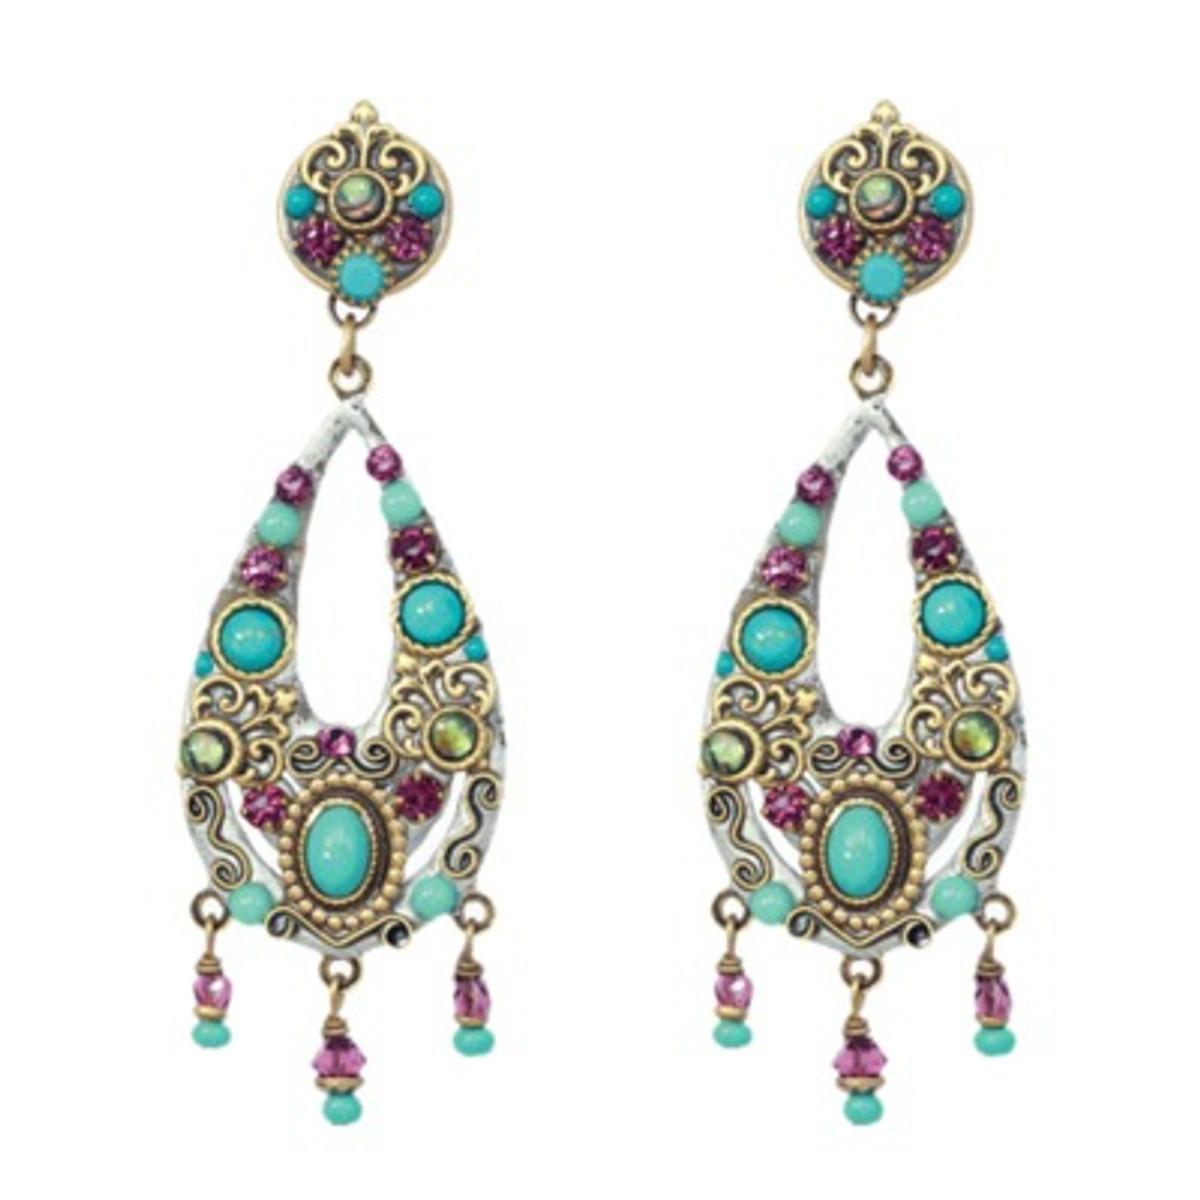 Michal Golan Earrings - Turkish Bazzar 2 Part Oval 3 Drops